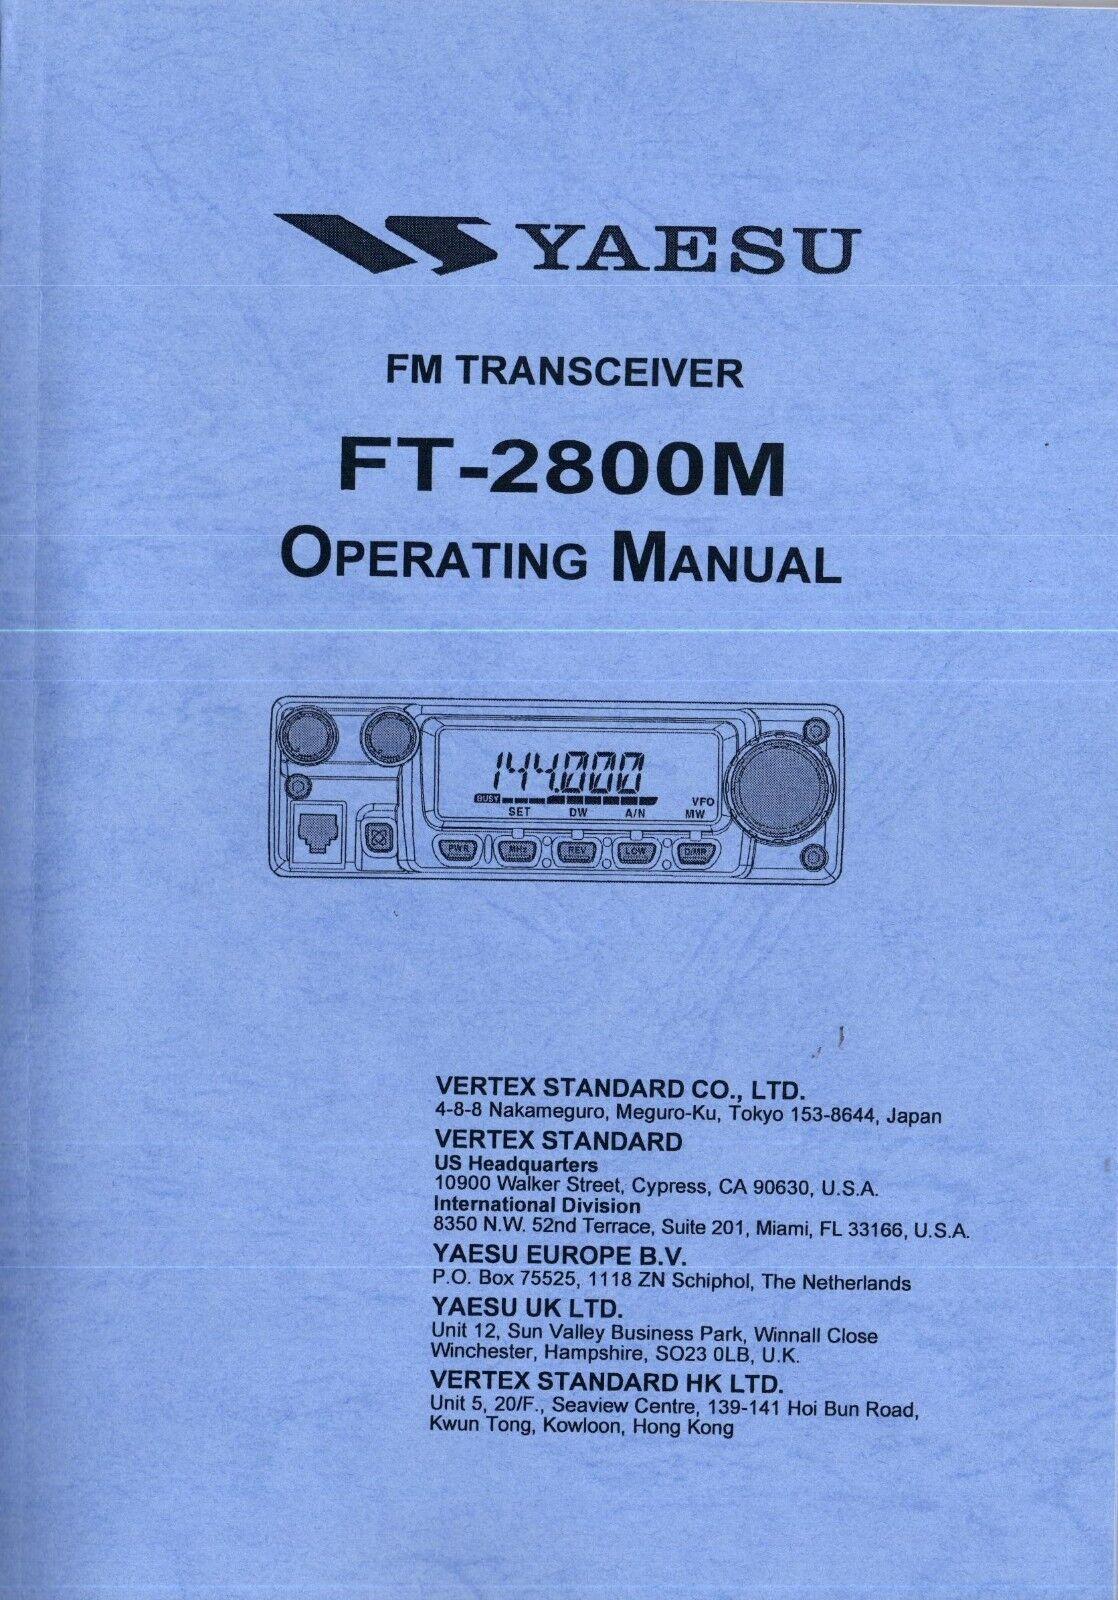 palacemuseum NEW Yaesu FT-2800M Operating Manual Book in English